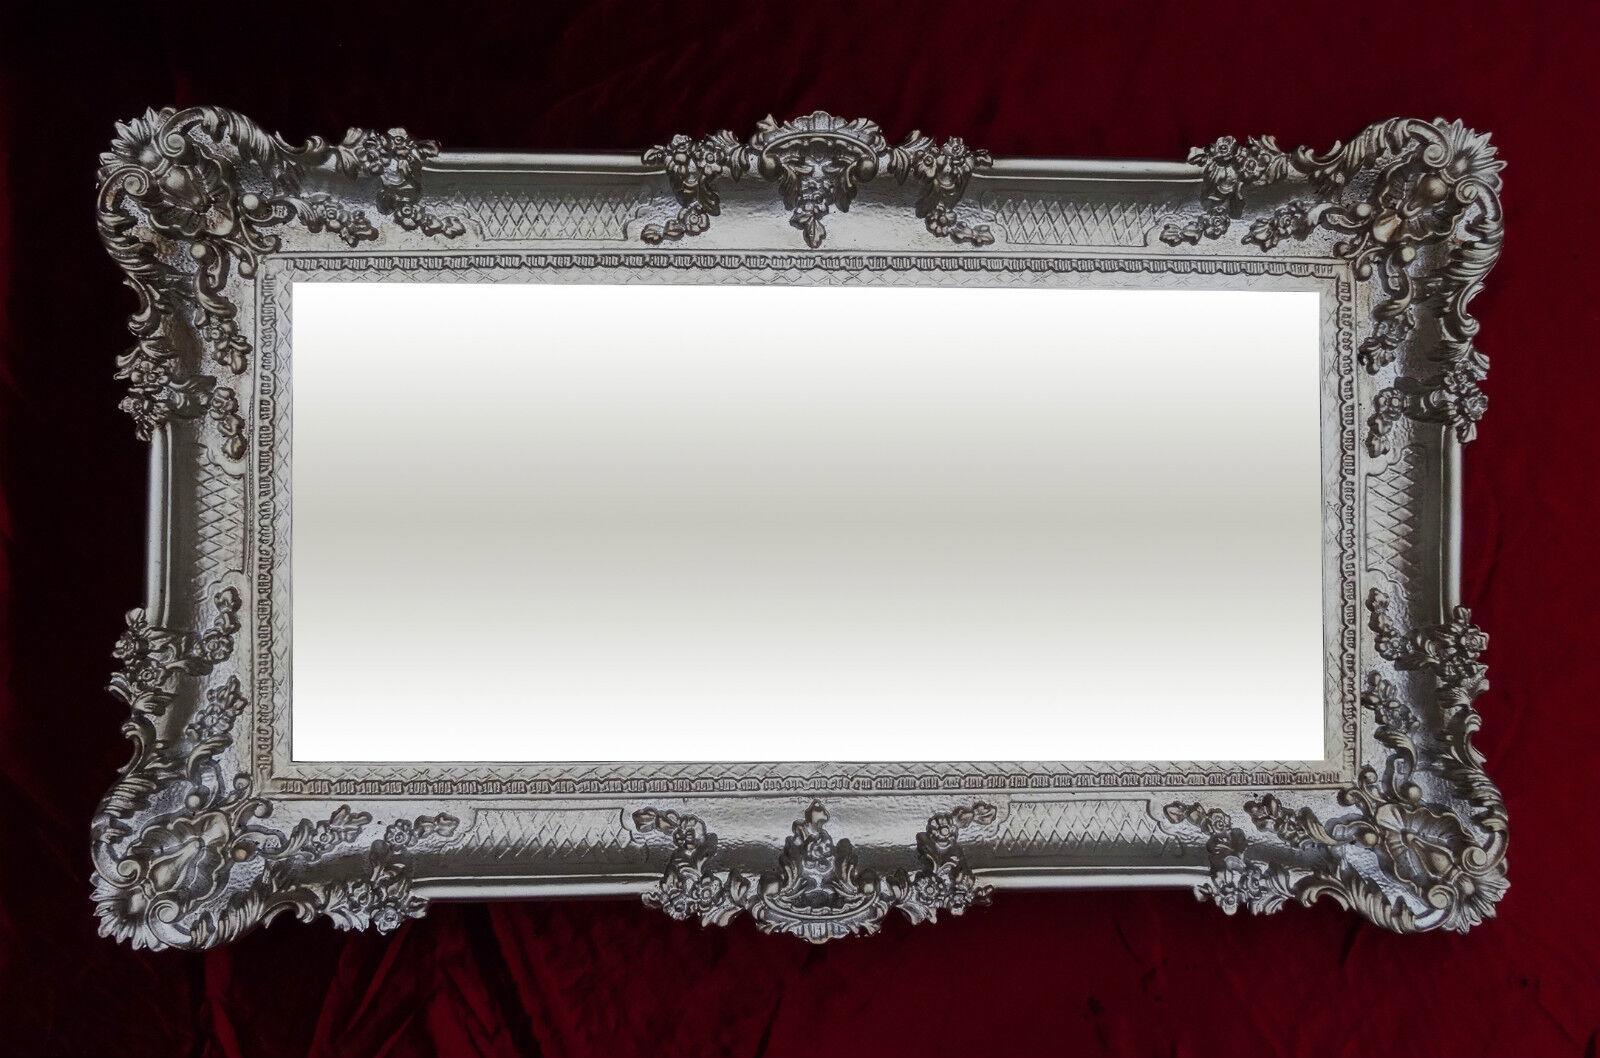 xxl barock wandspiegel altsilber 96x57 cm antik rokoko. Black Bedroom Furniture Sets. Home Design Ideas